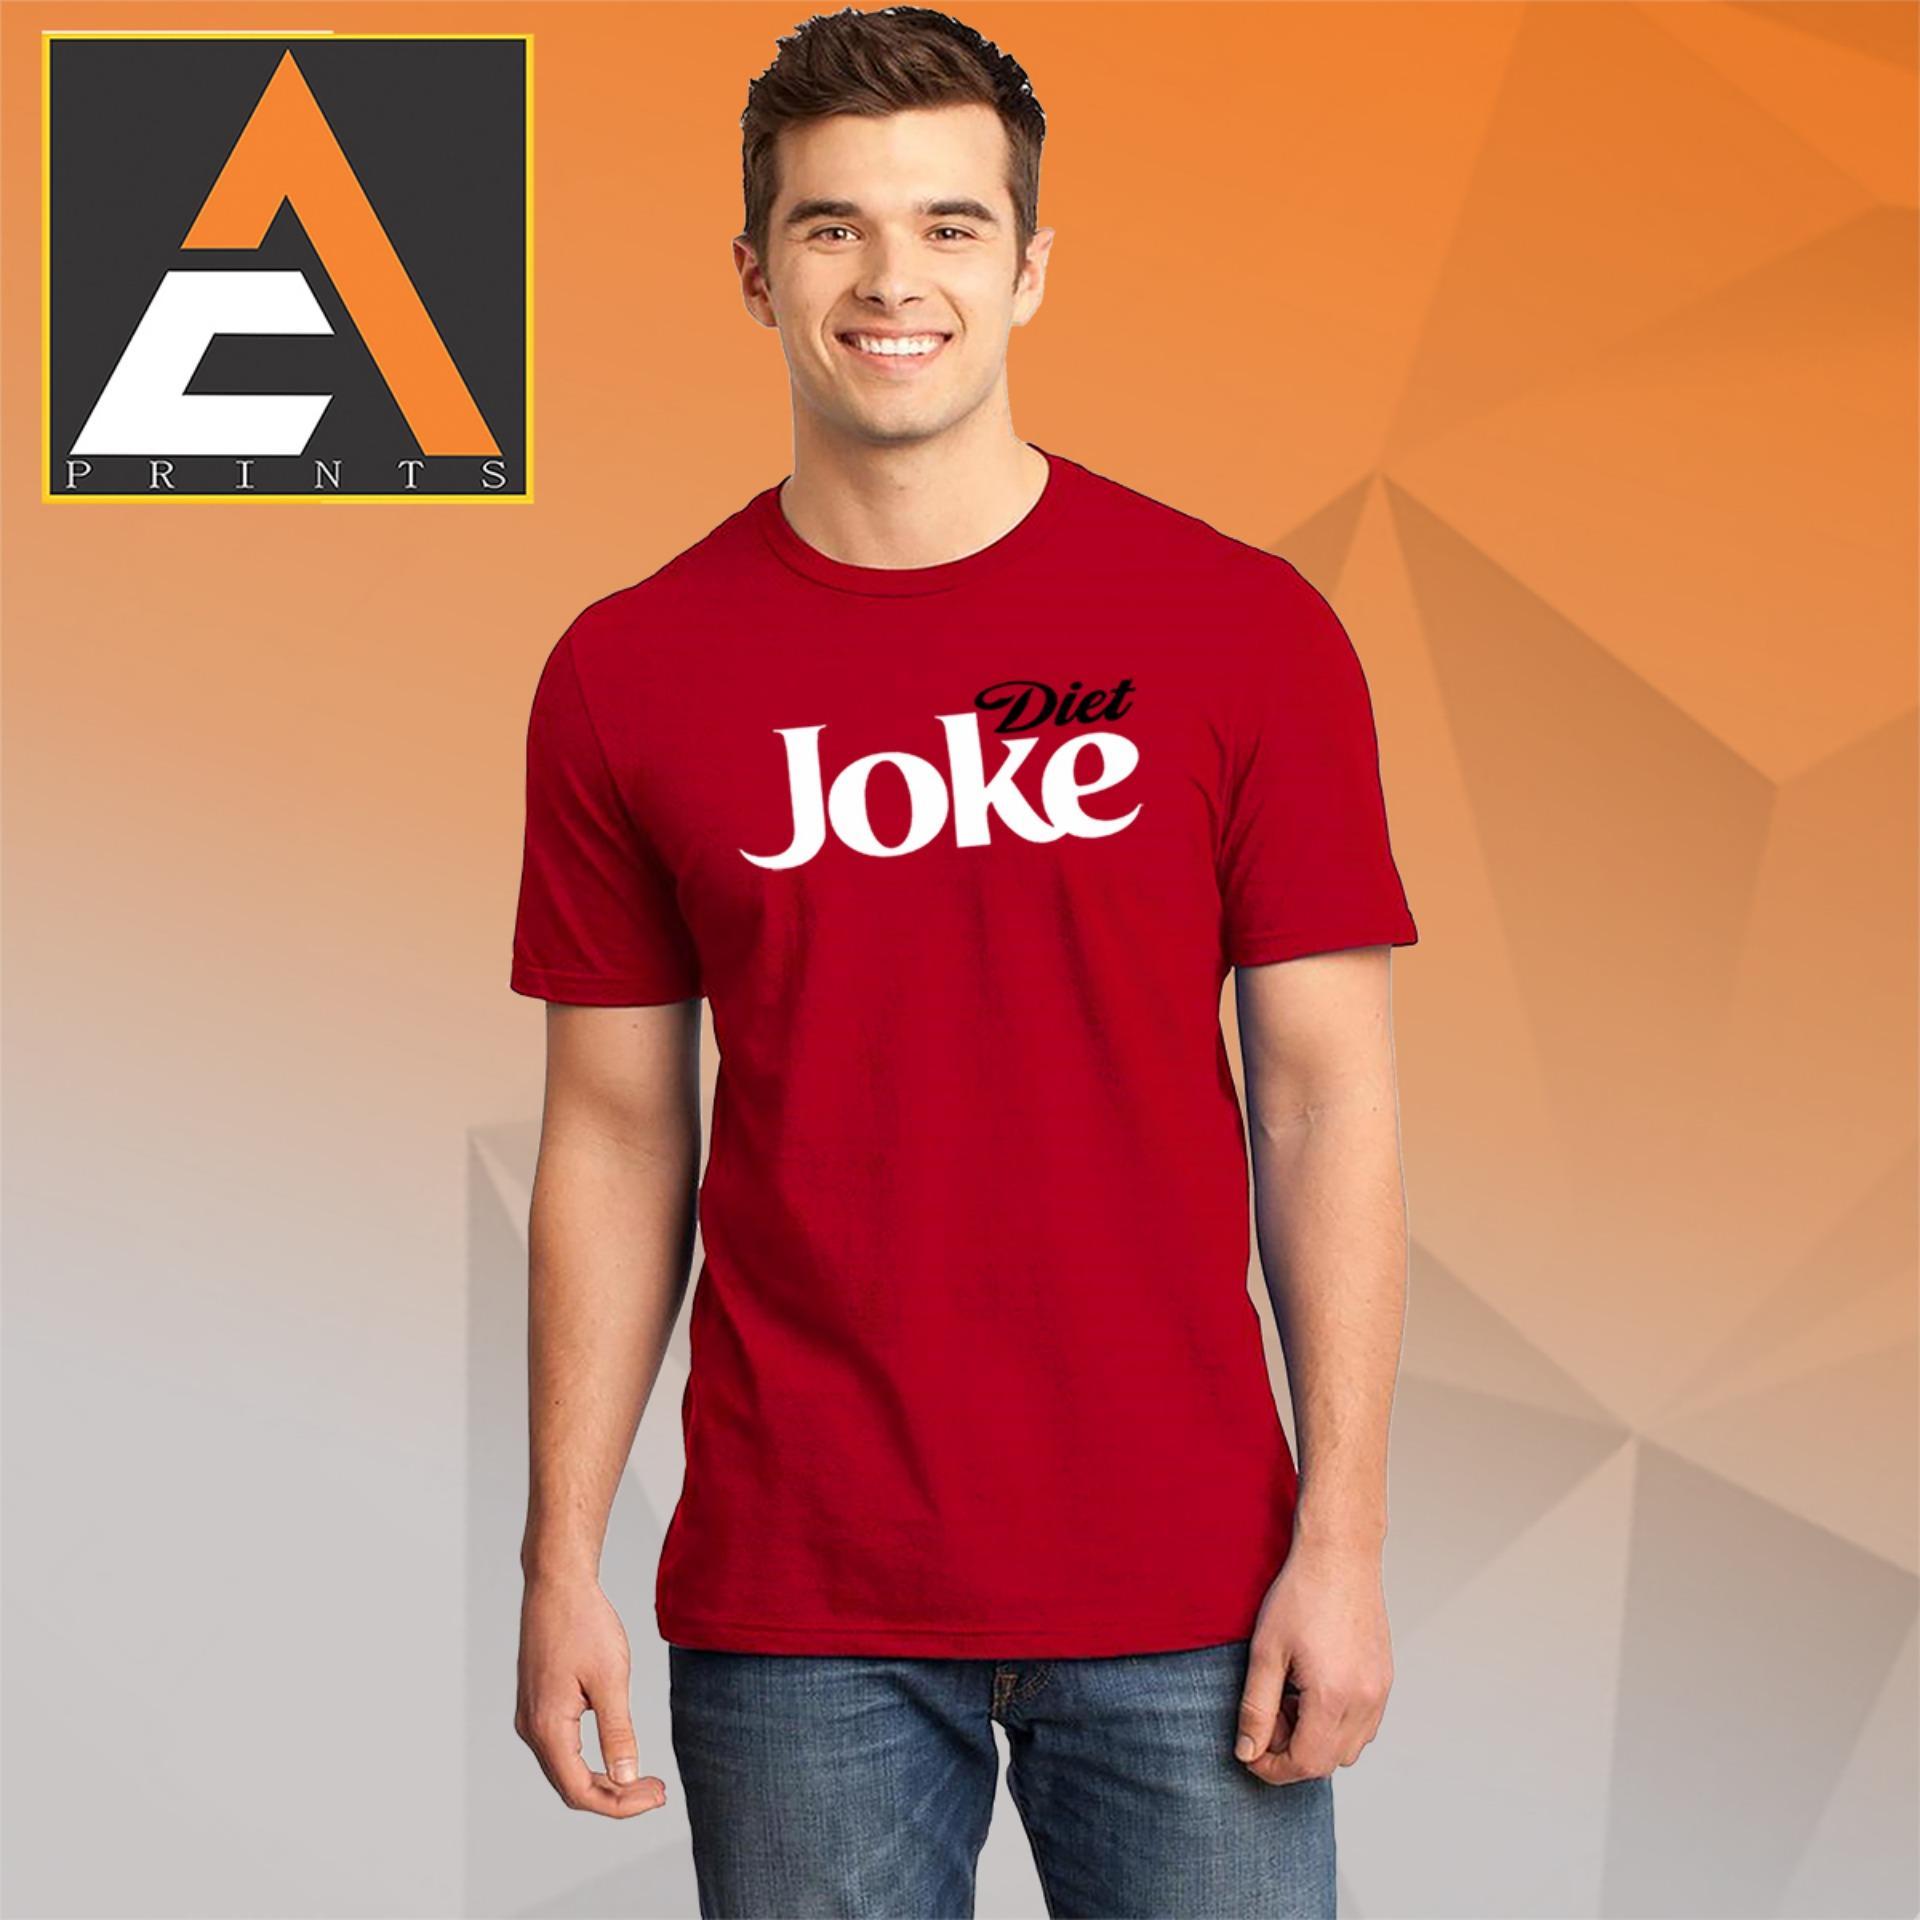 37f7852e Statement shirt Spoofs shirt Diet Joke Shirt  Unisex(Men/Women)(Male/Female)(Gildan) T-shirts Tees T shirts Tshirts  Tees(black,blue,red,white) Sale by ...